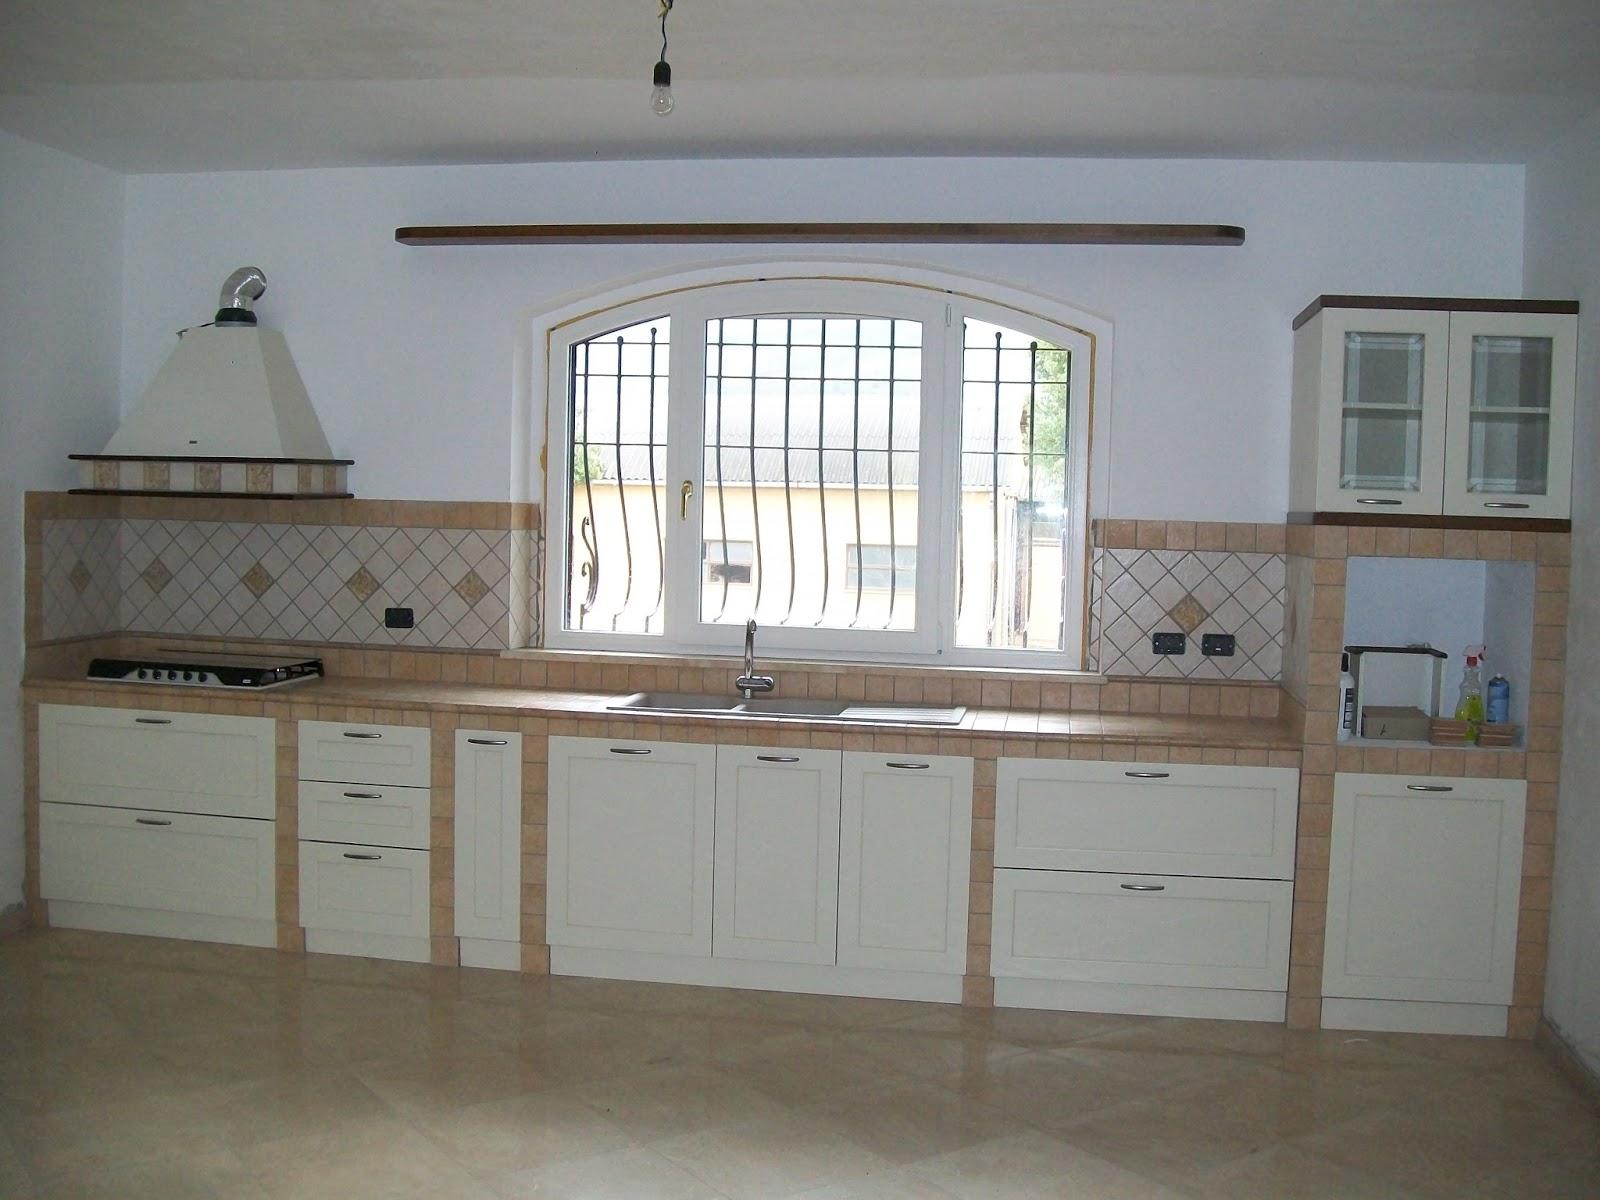 Realizzare Cucina In Muratura | Cucine In Finta Muratura Foto Design Mag